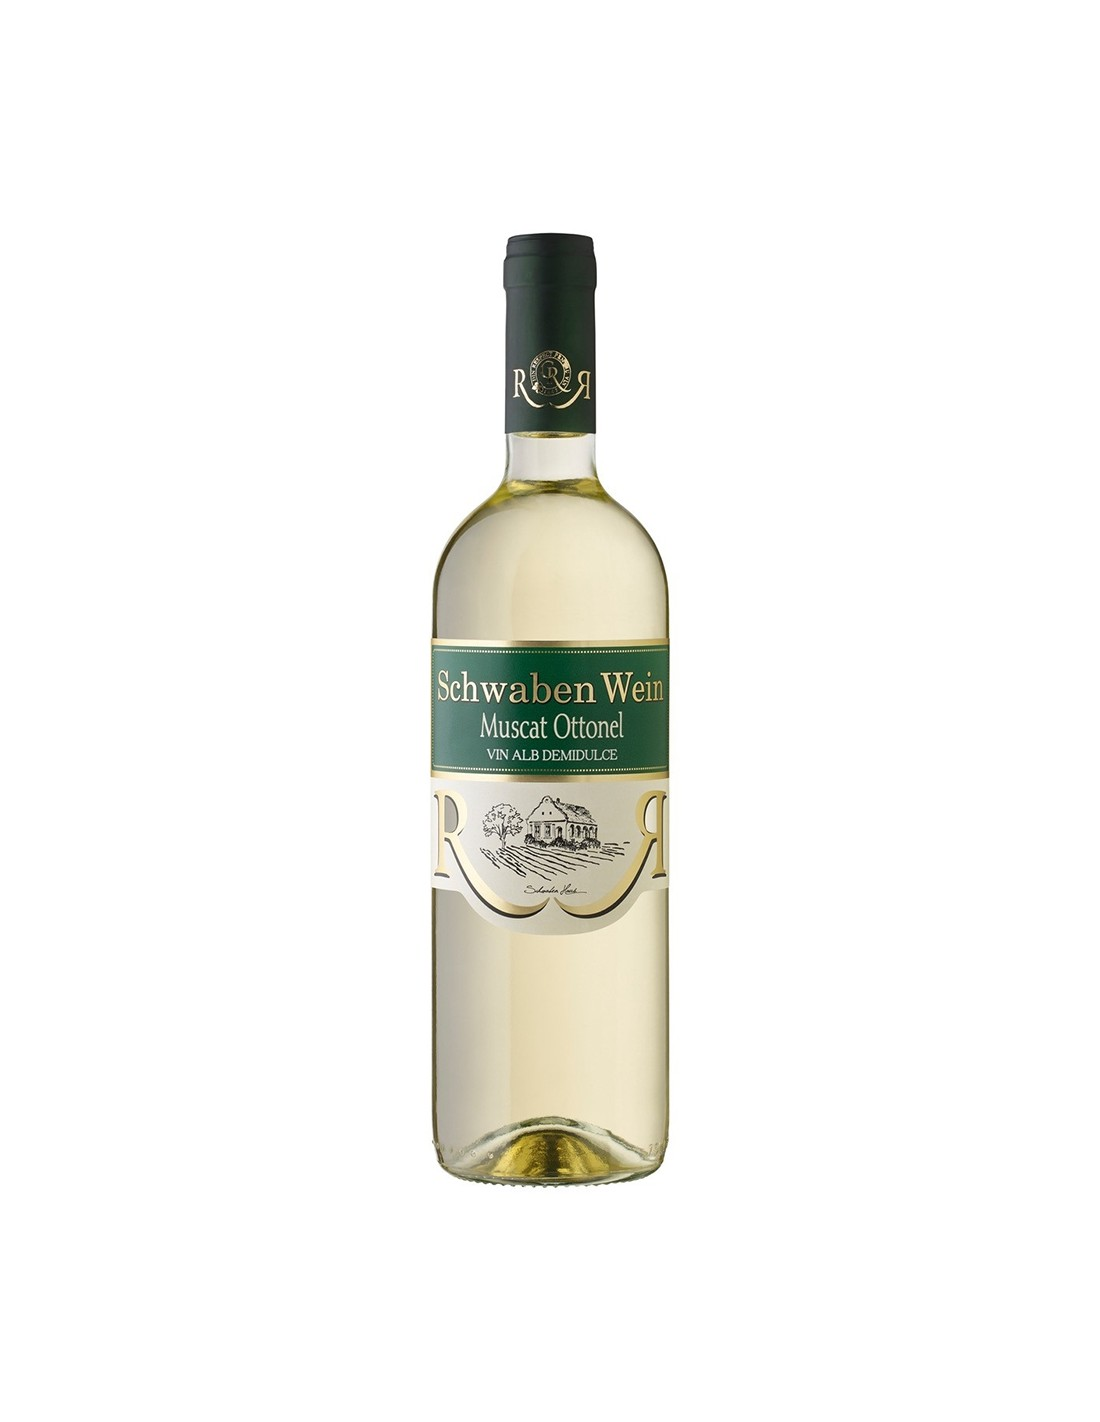 Vin alb demidulce, Muscat Ottonel, Schwaben Wein Recas, 0.75L, 12% alc., Romania